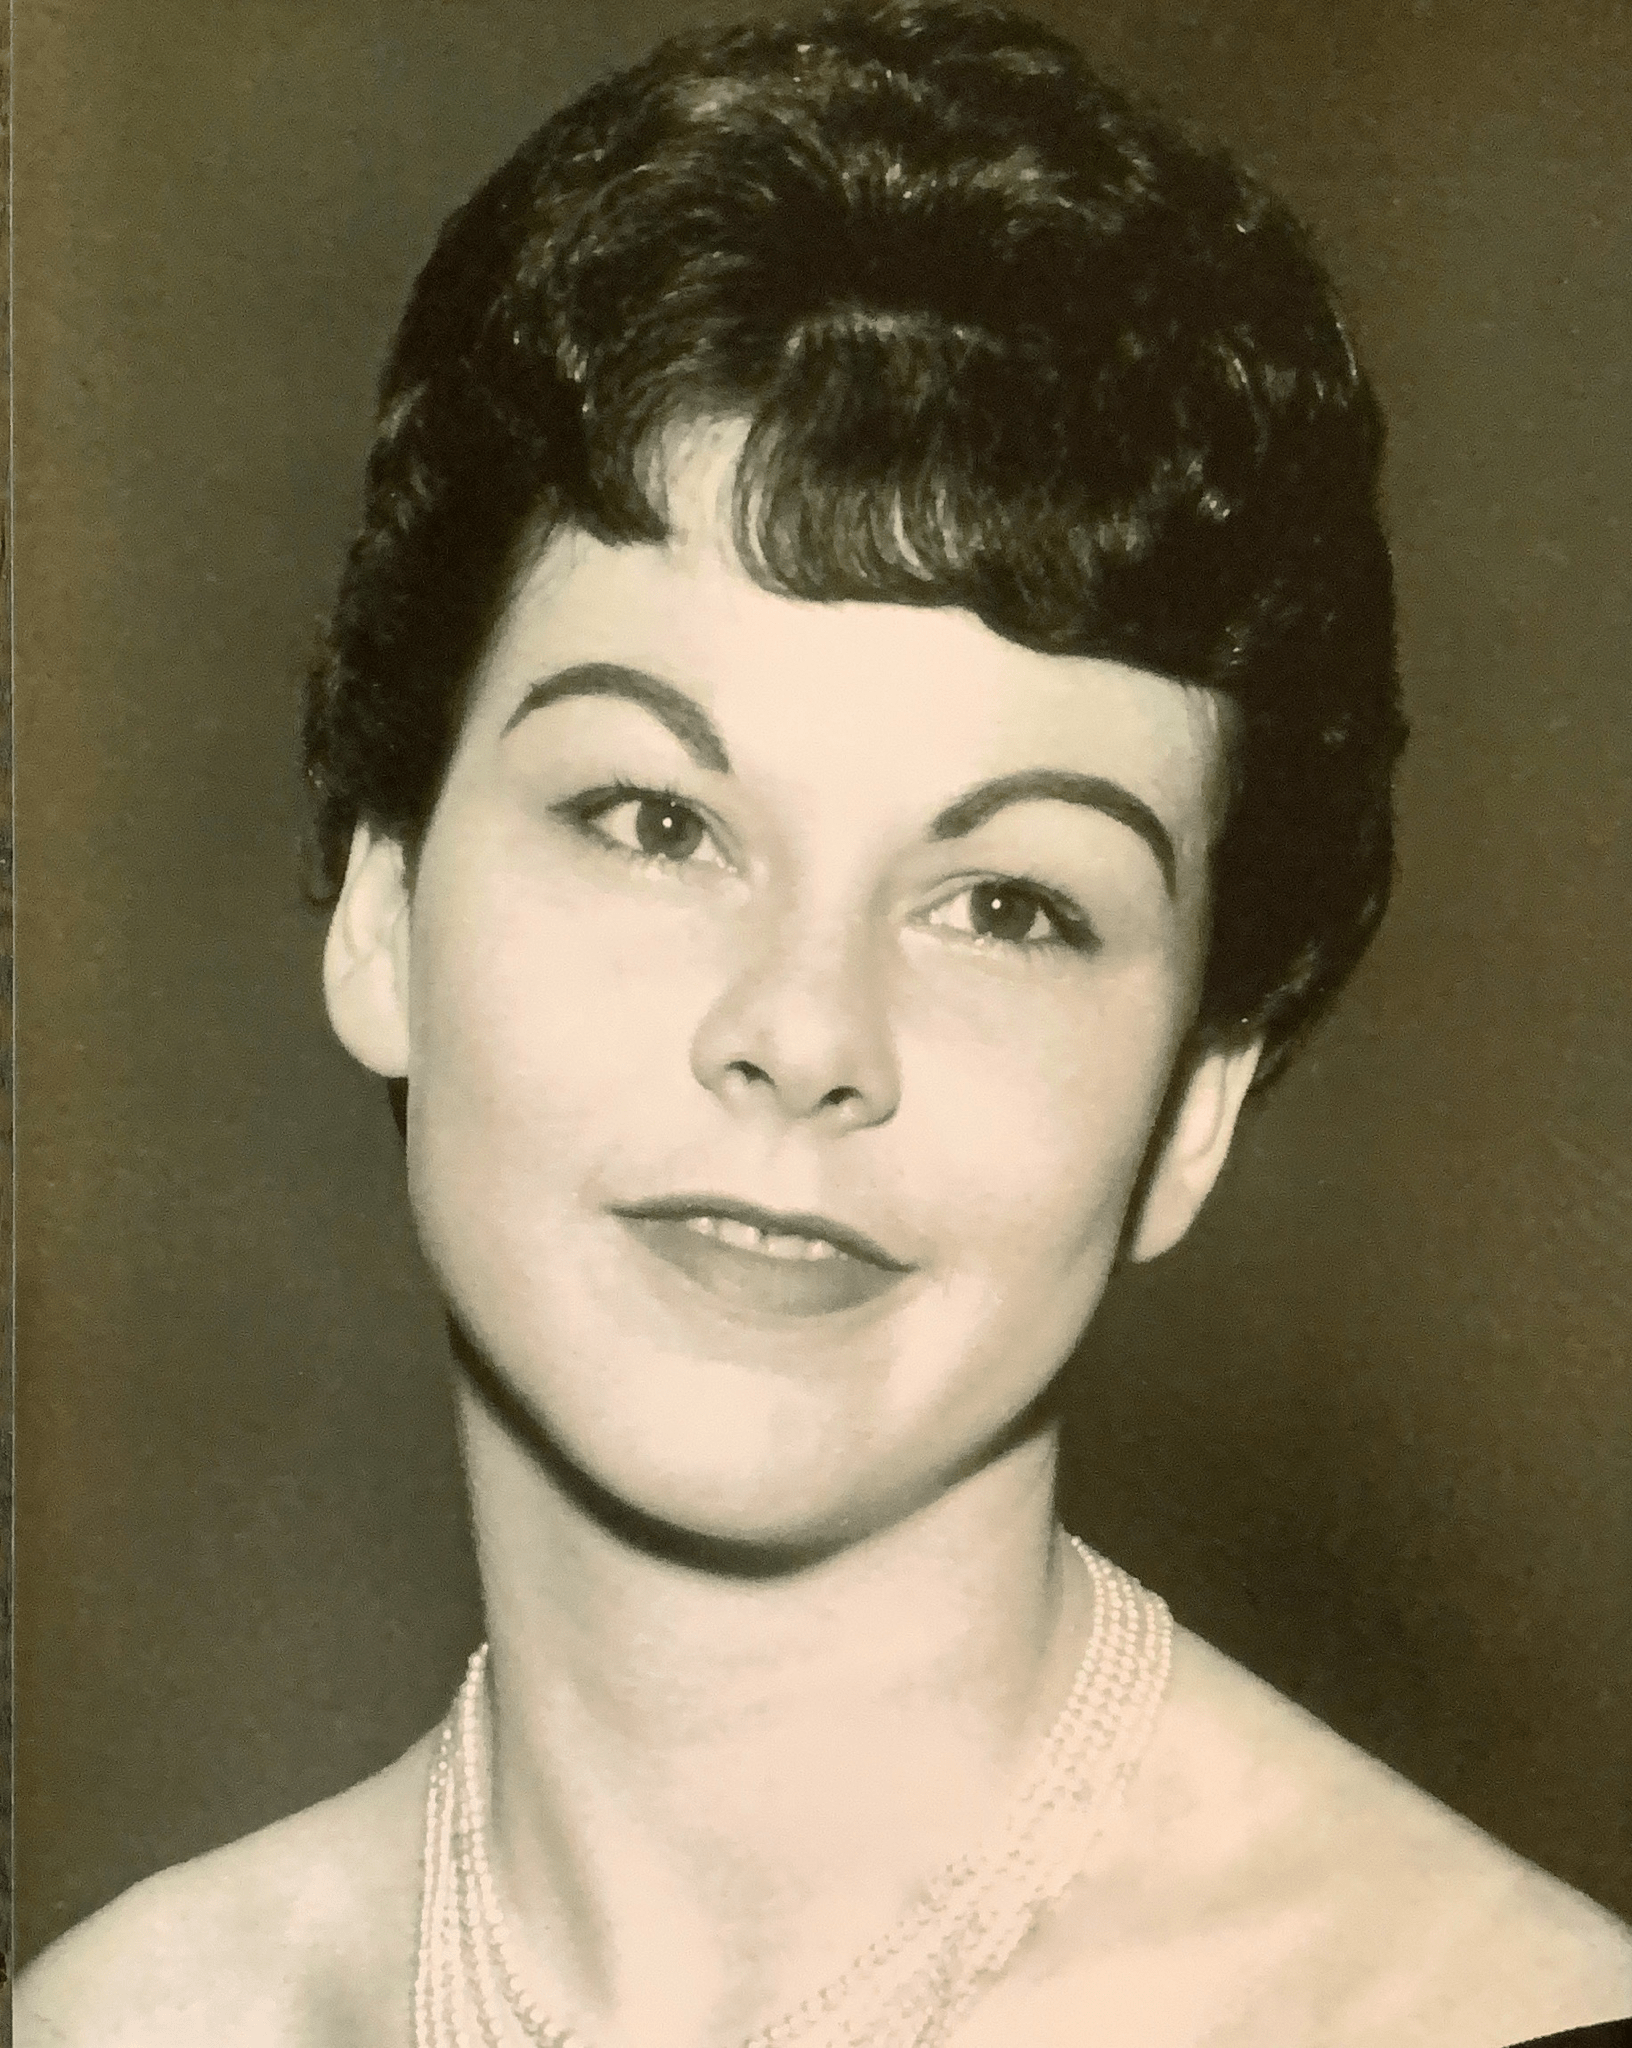 Linda Bracken